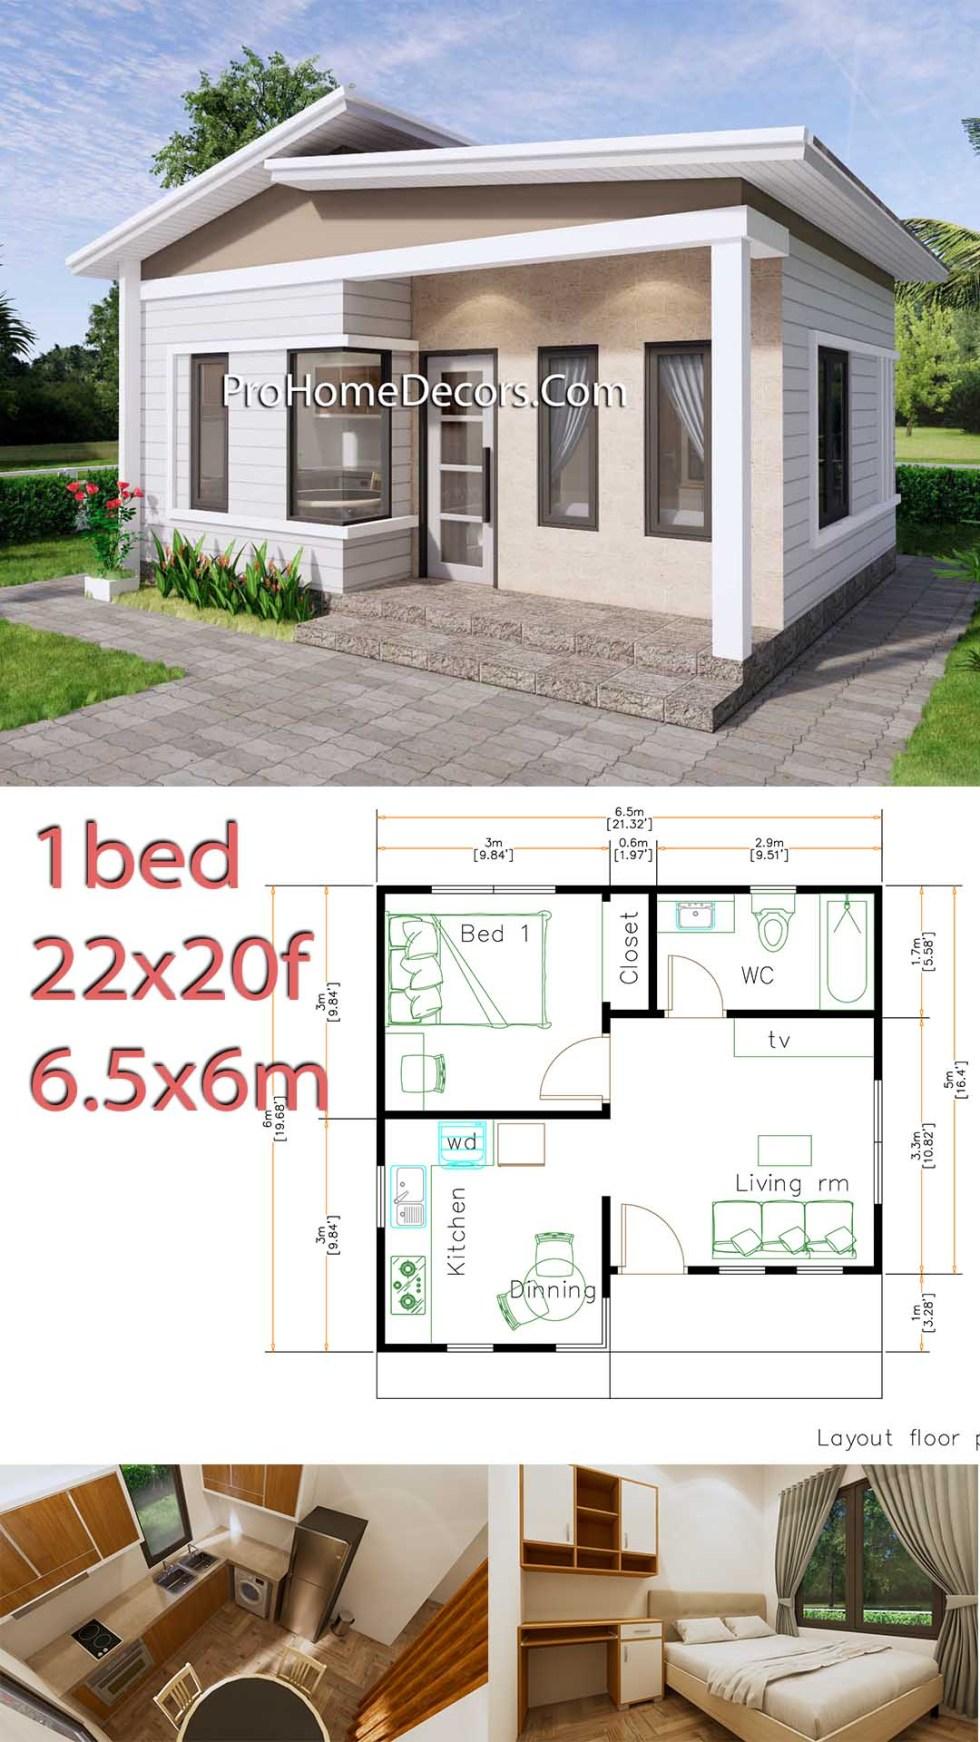 Small House Plans 6.5x6 Meter 22x20 Feet PDF Floor Plans P1